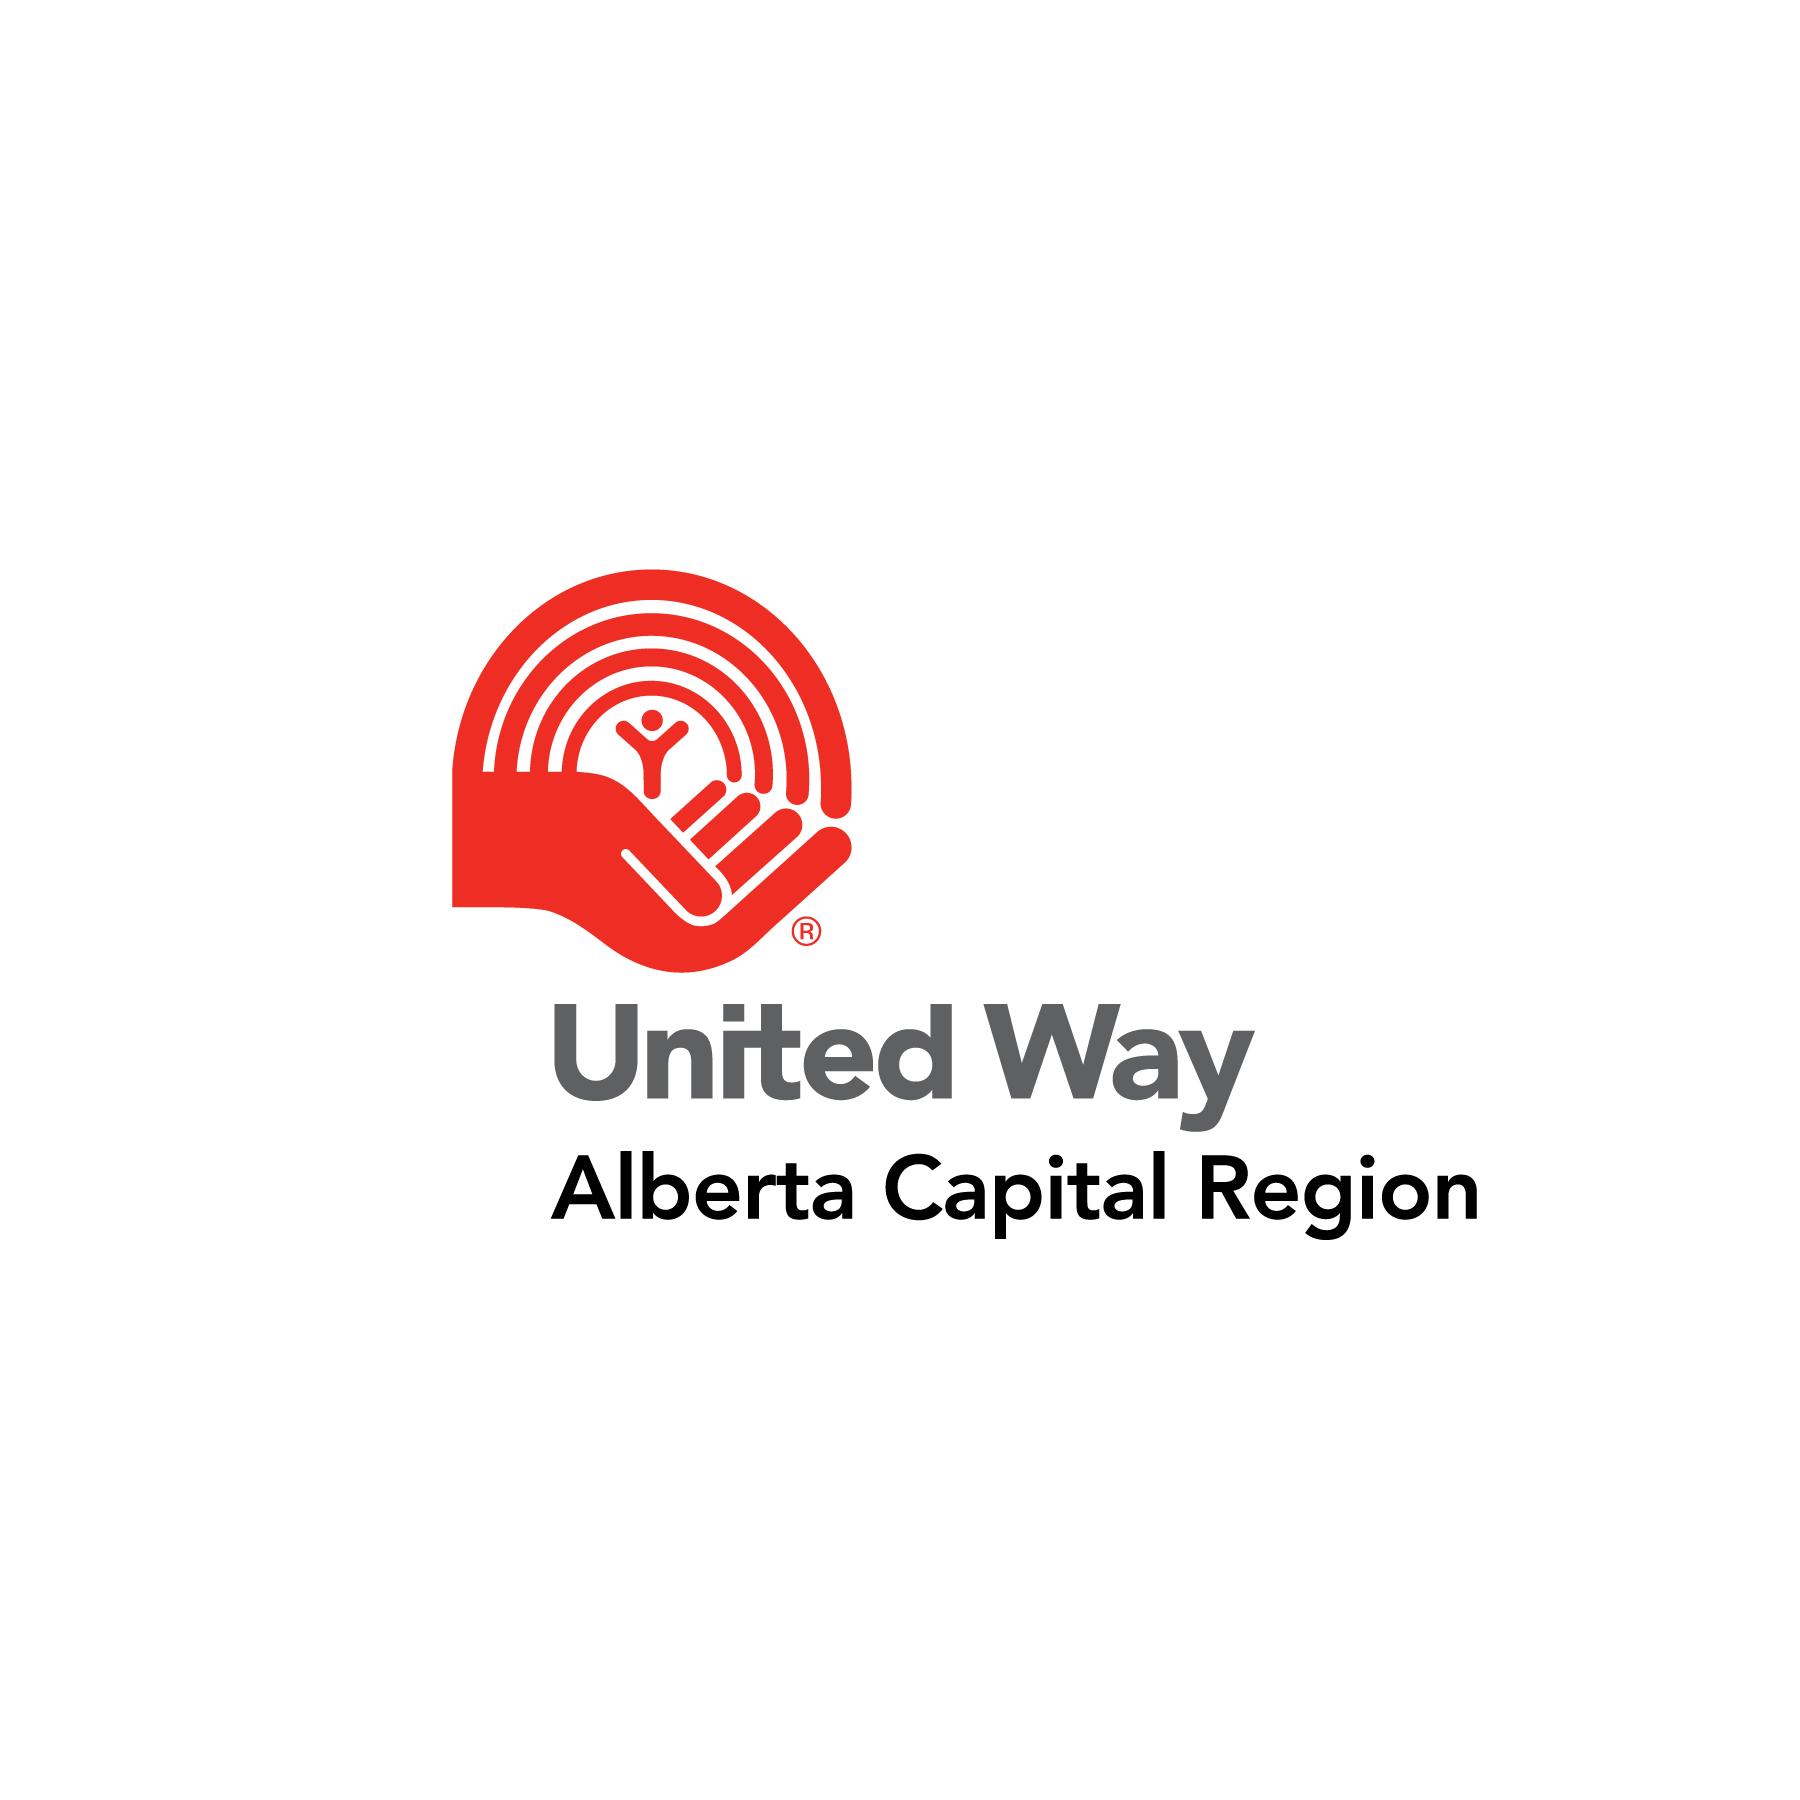 united way alberta capital region logo.jpg